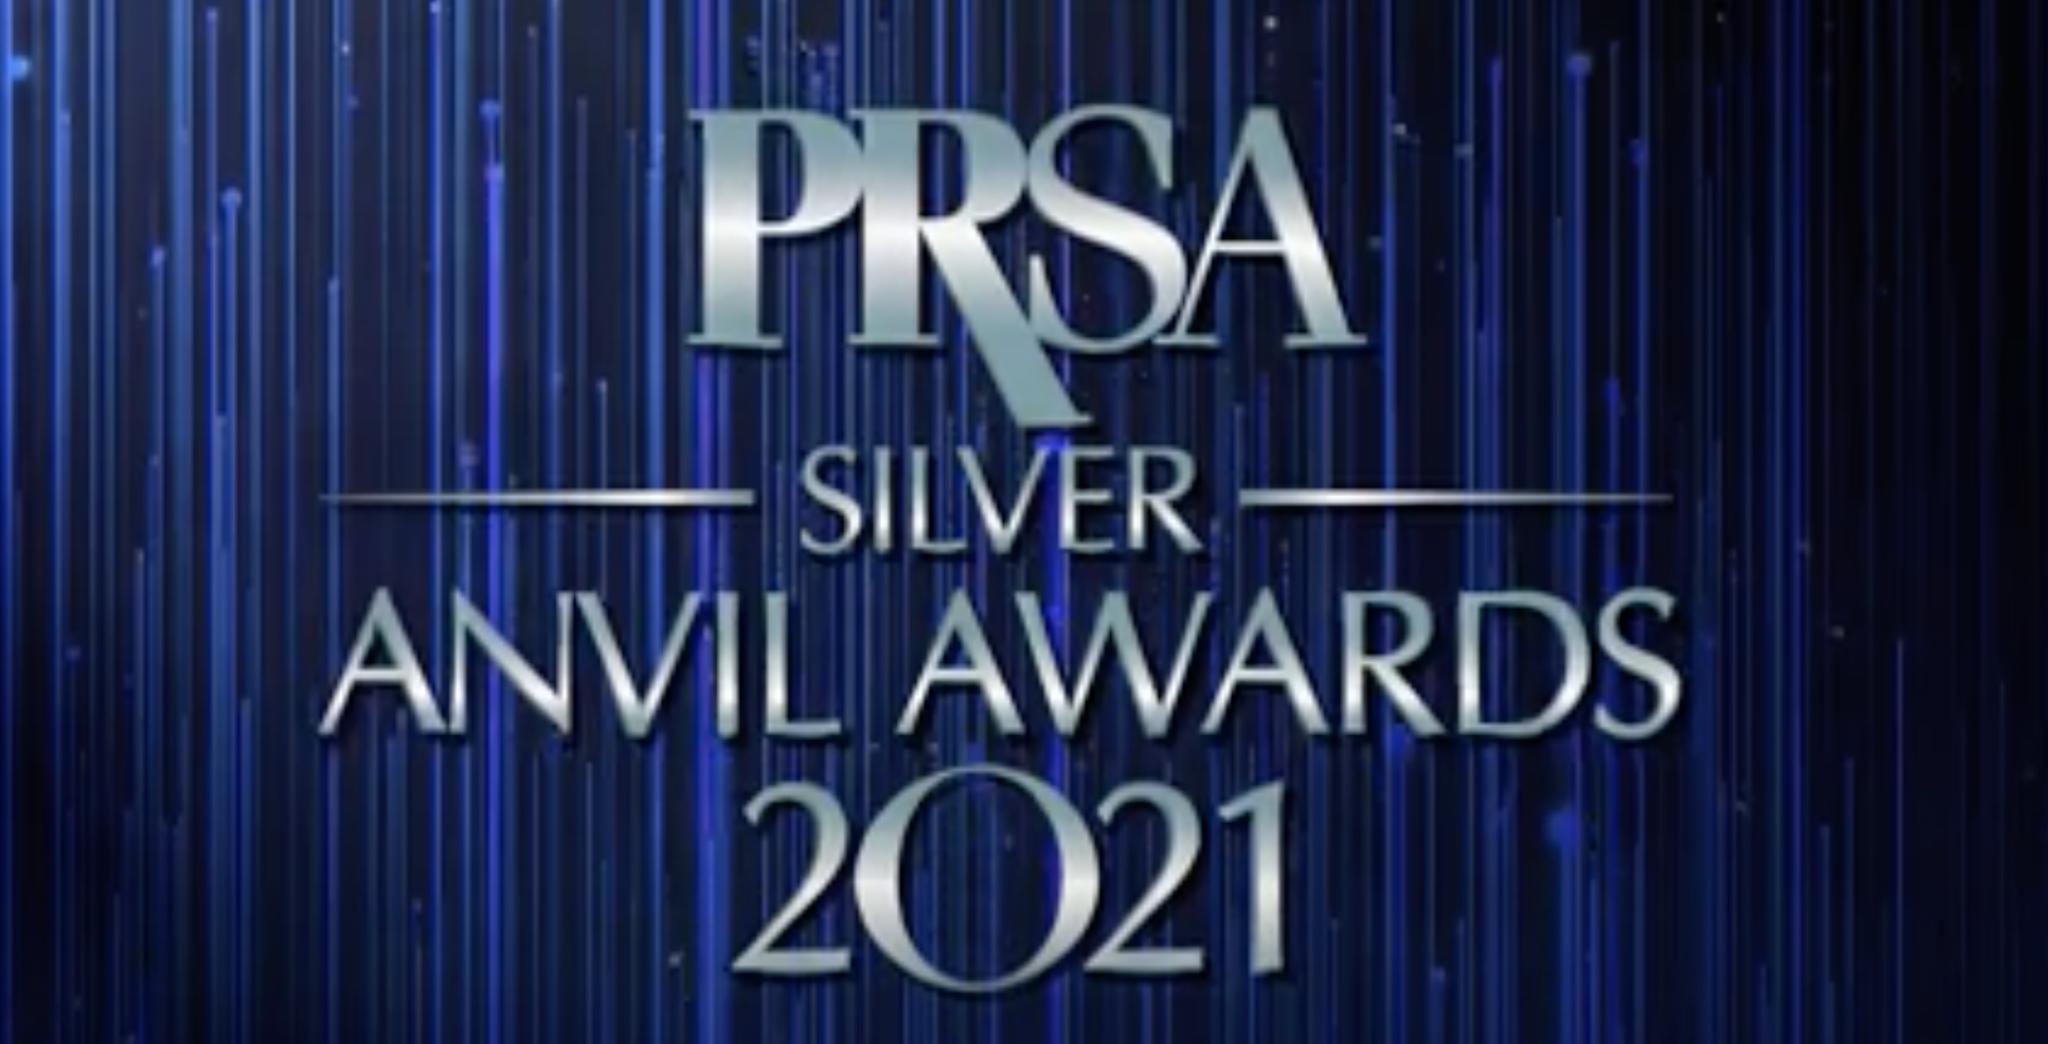 PRSA 2021 Silver Anvils